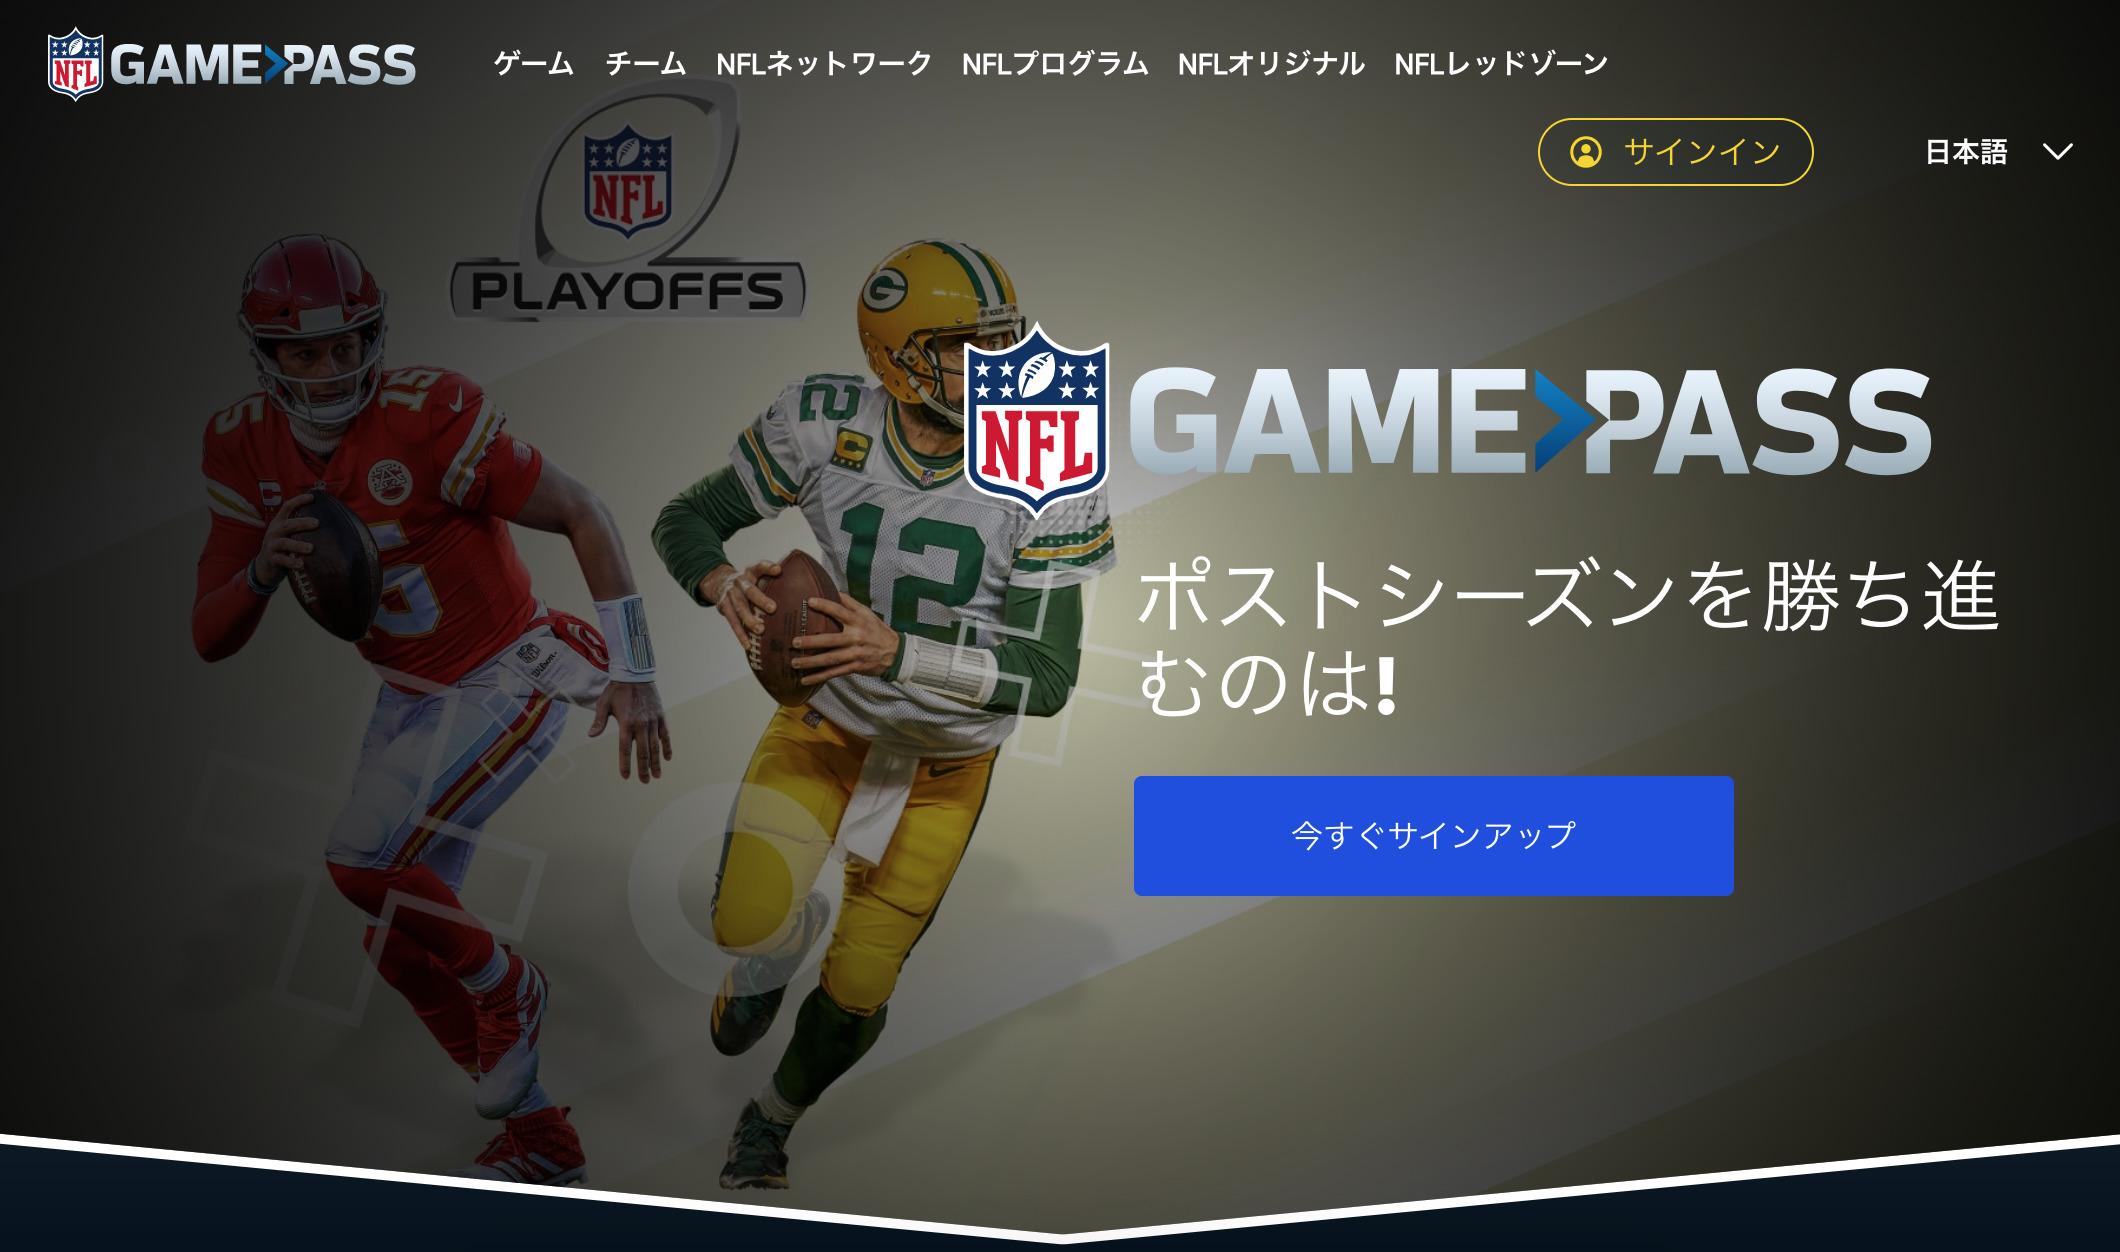 NFL GAME PASS(NFLゲームパス)